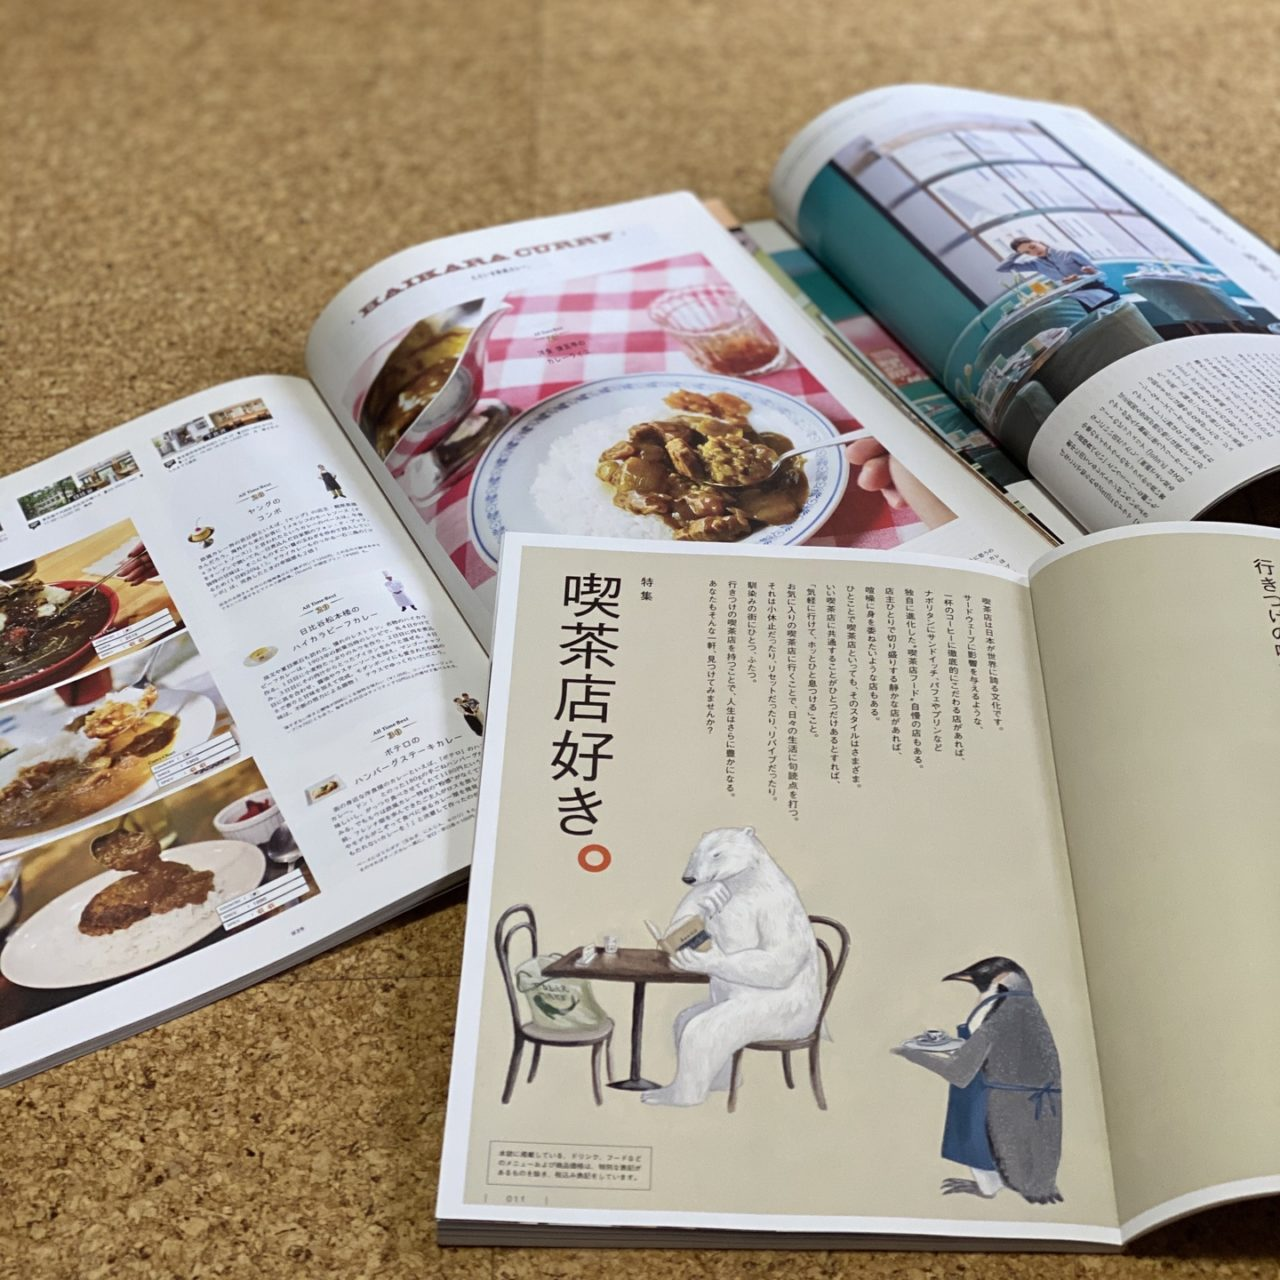 趣味関連の雑誌